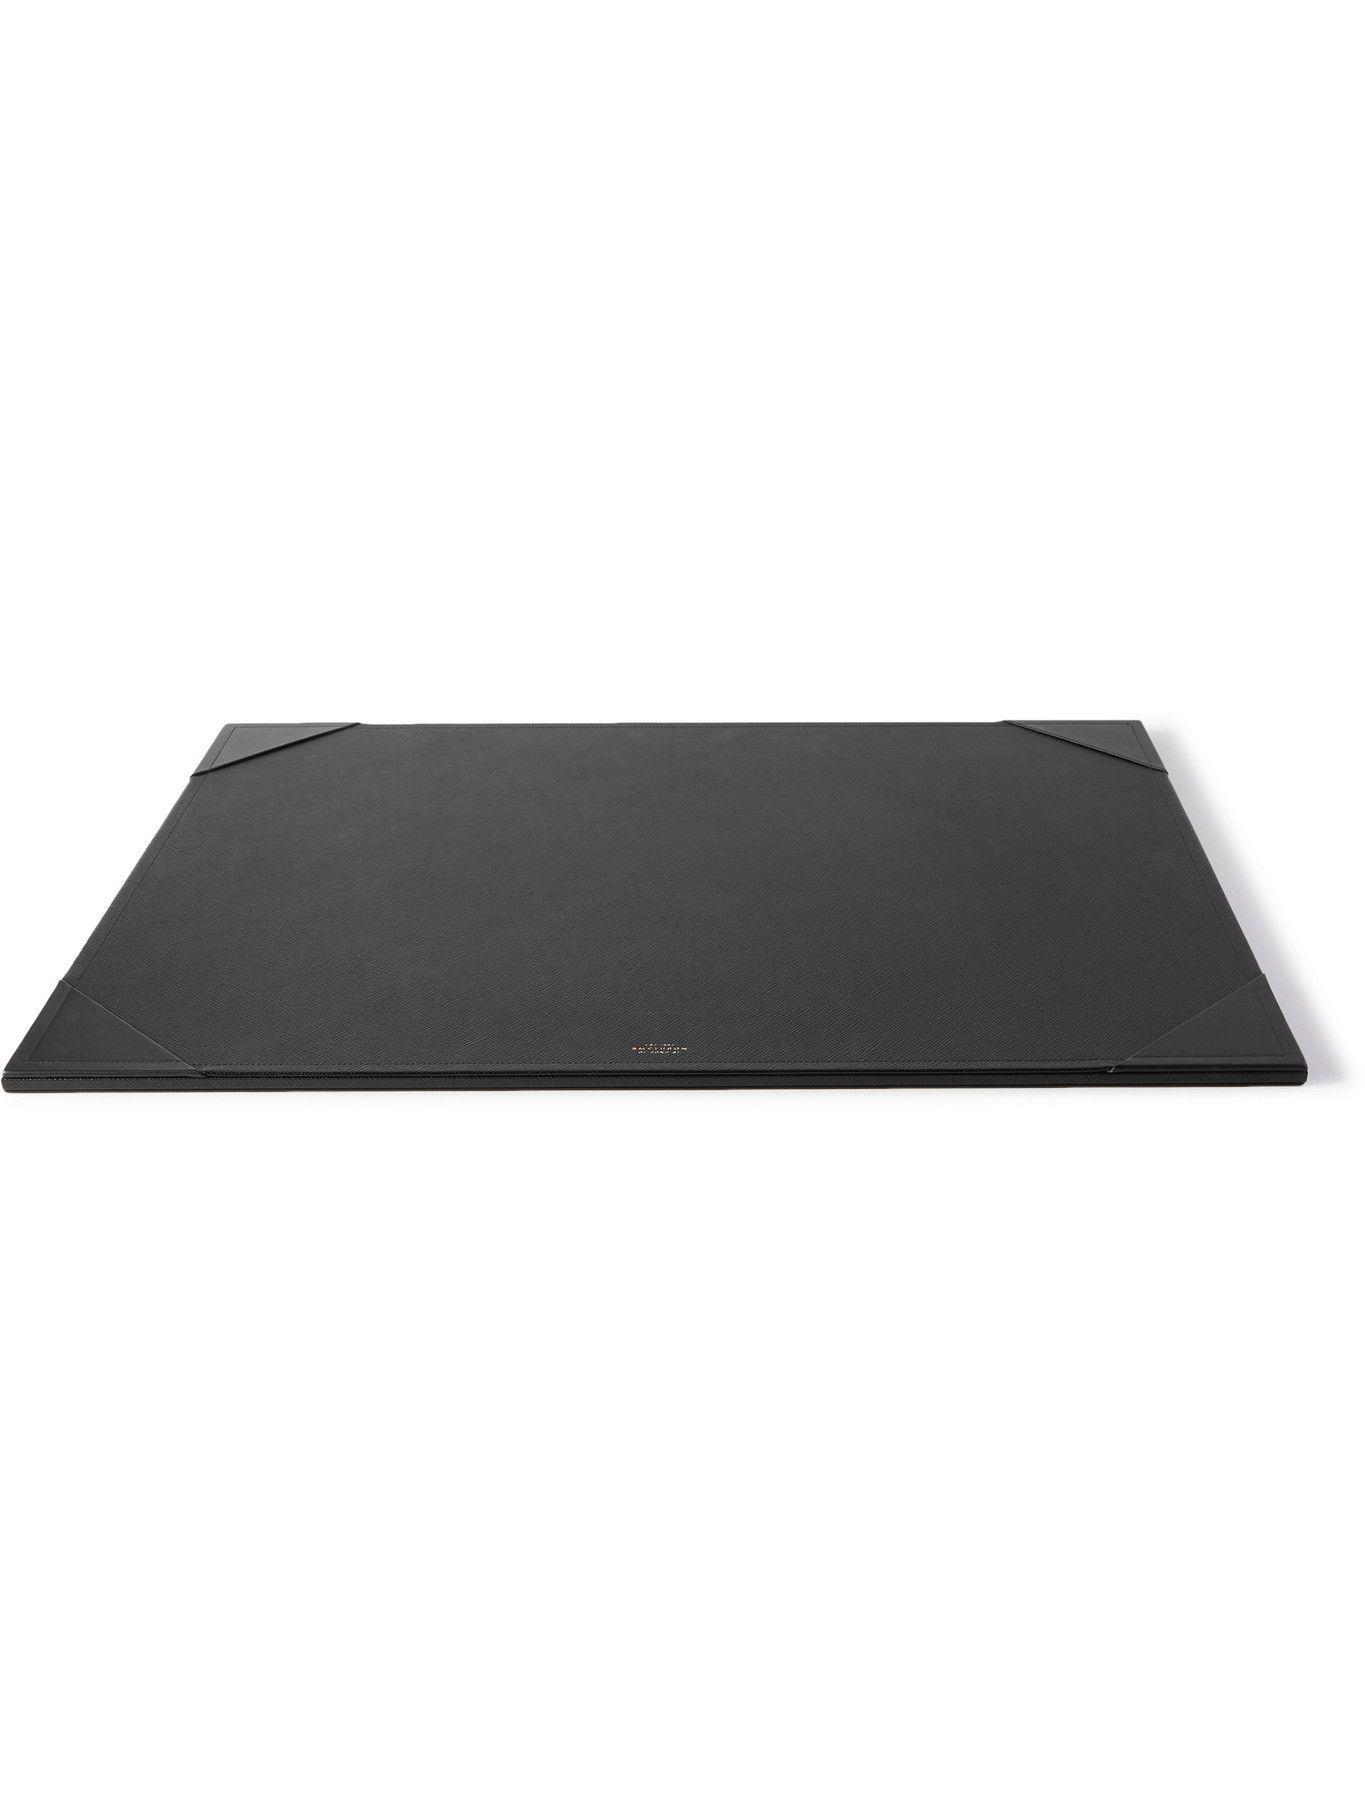 Photo: Smythson - Panama Large Cross-Grain Leather Desk Mat